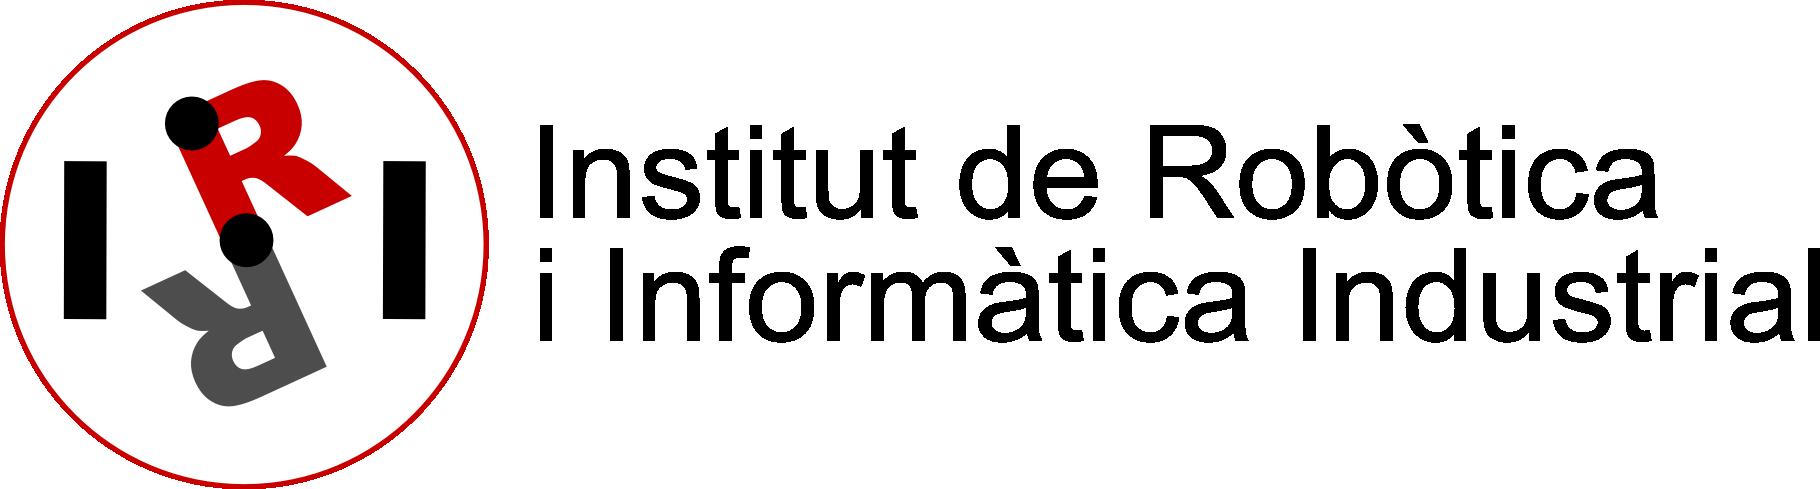 IRI-circle-text.png